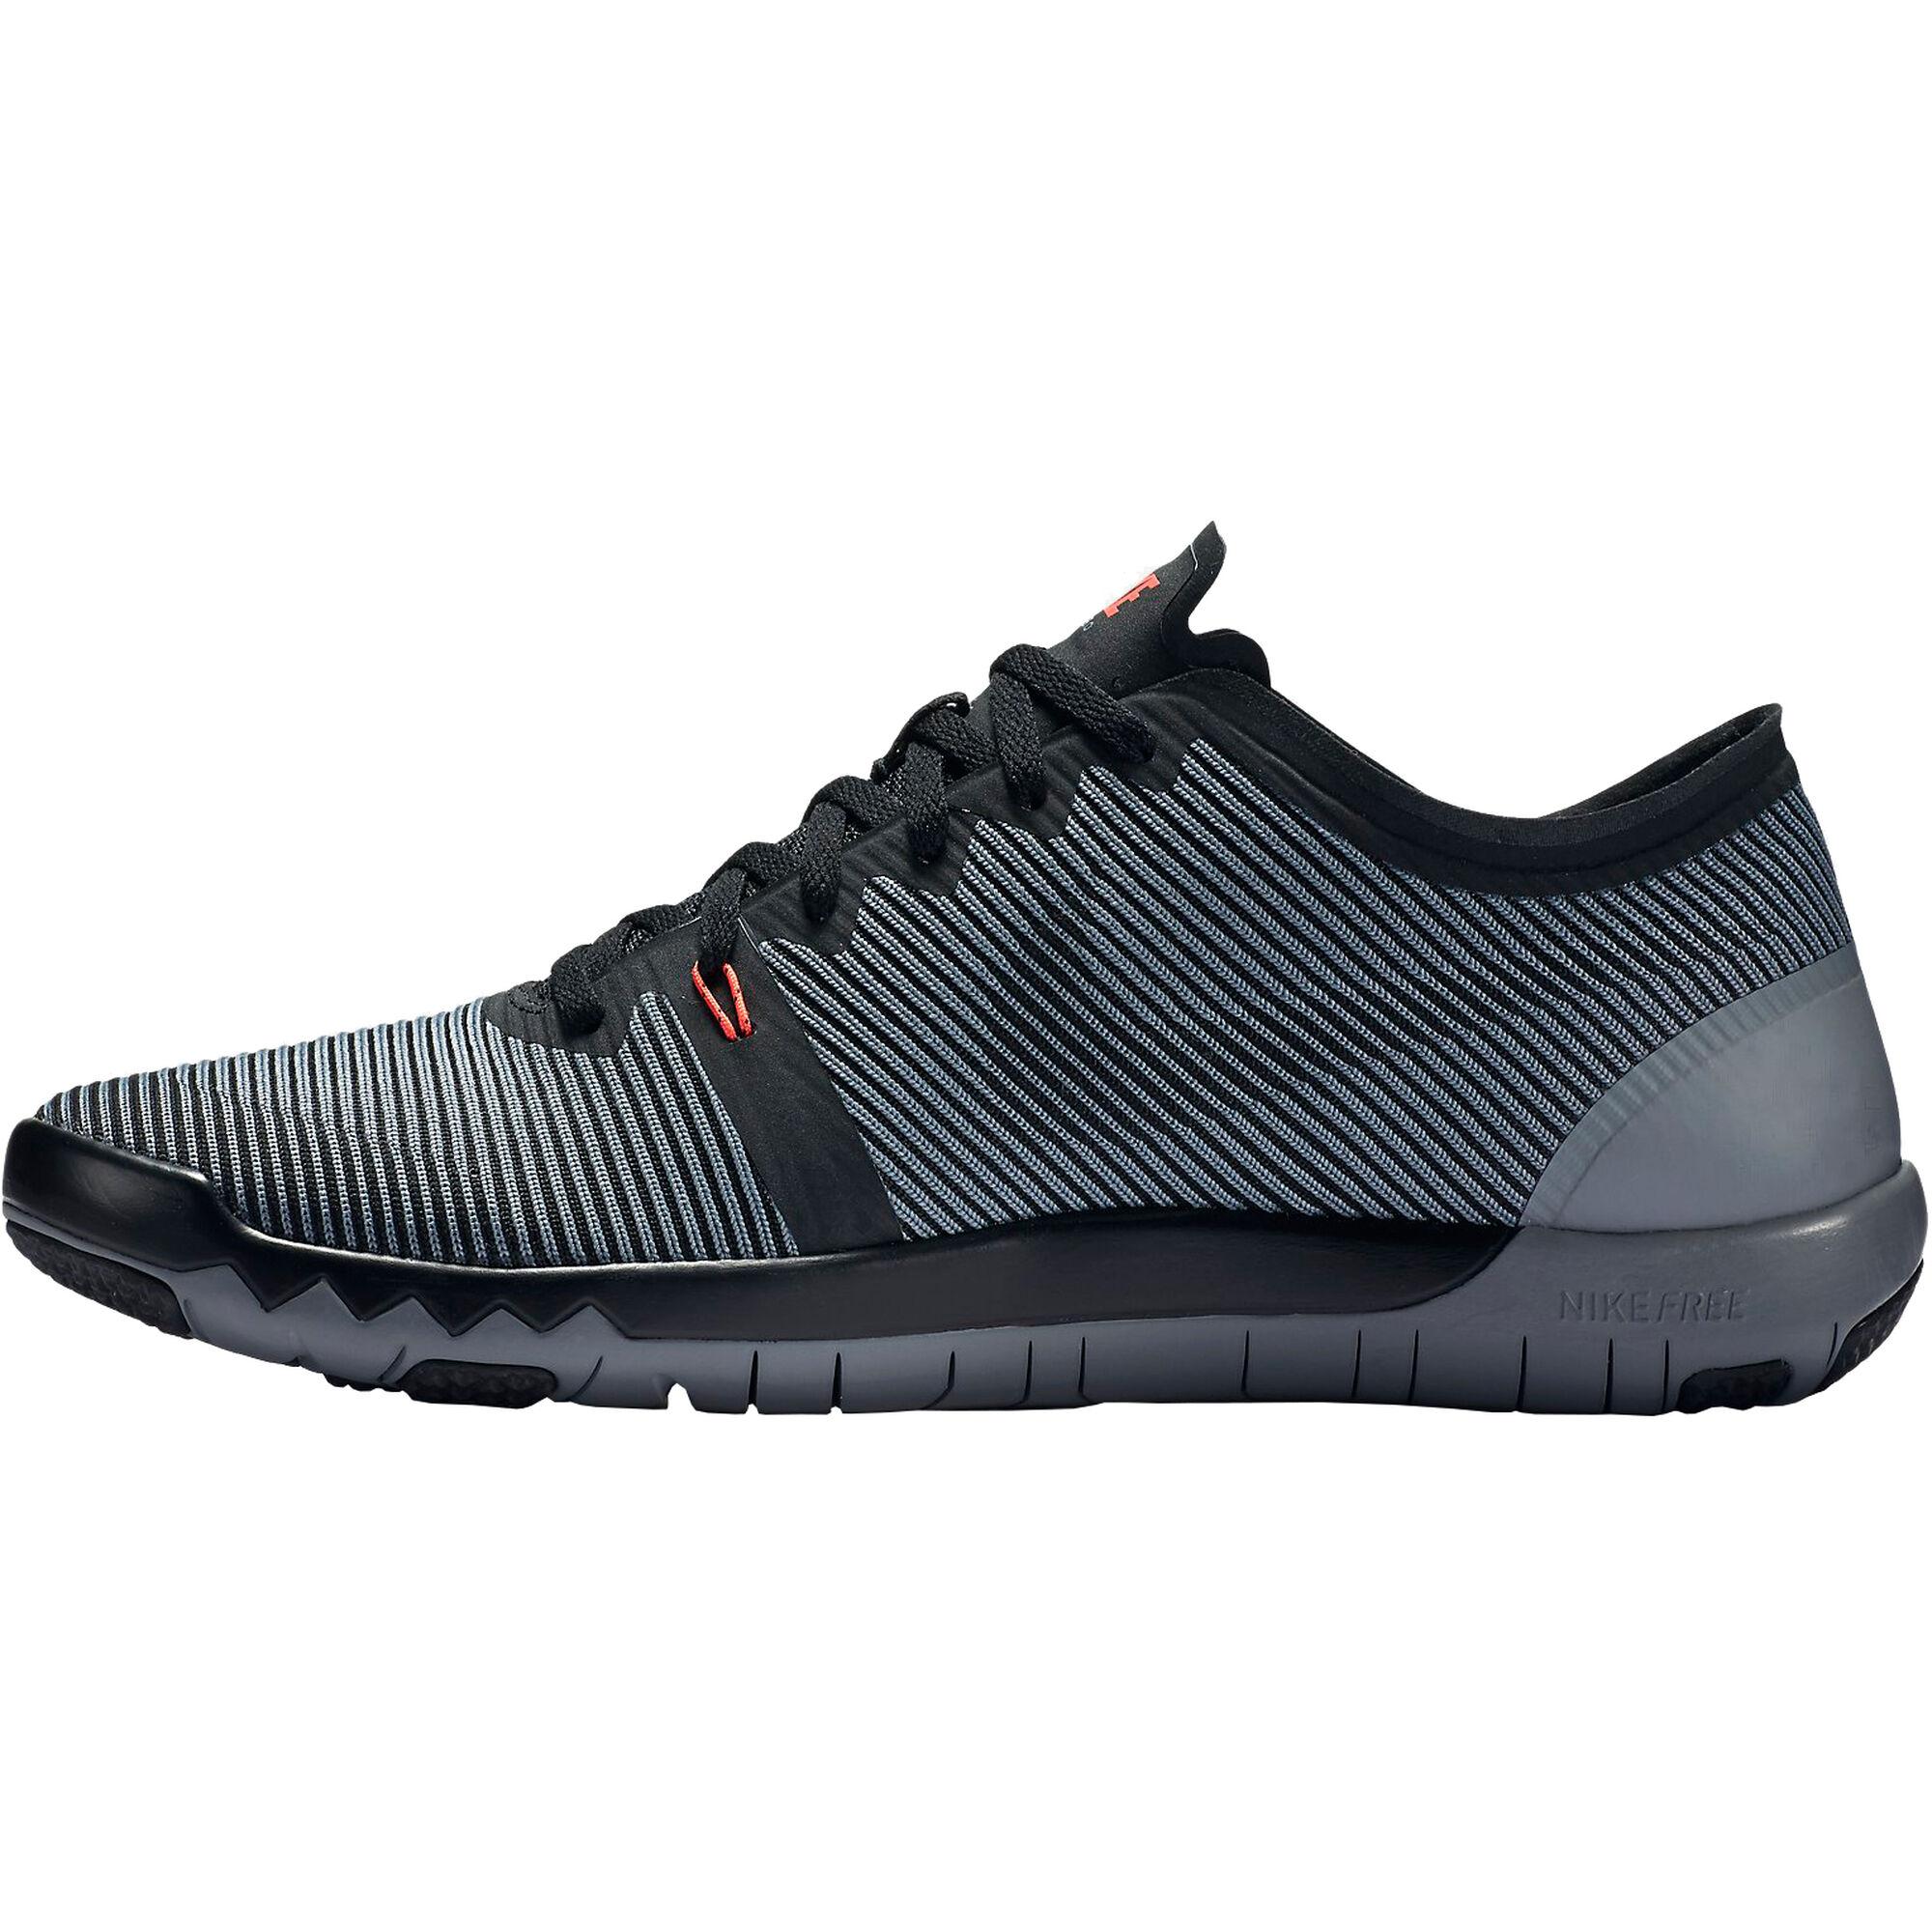 best service 148a0 7f8b6 Nike Free Trainer 3.0 V4 Fitnessschuh Herren - Grau, Grau online ...